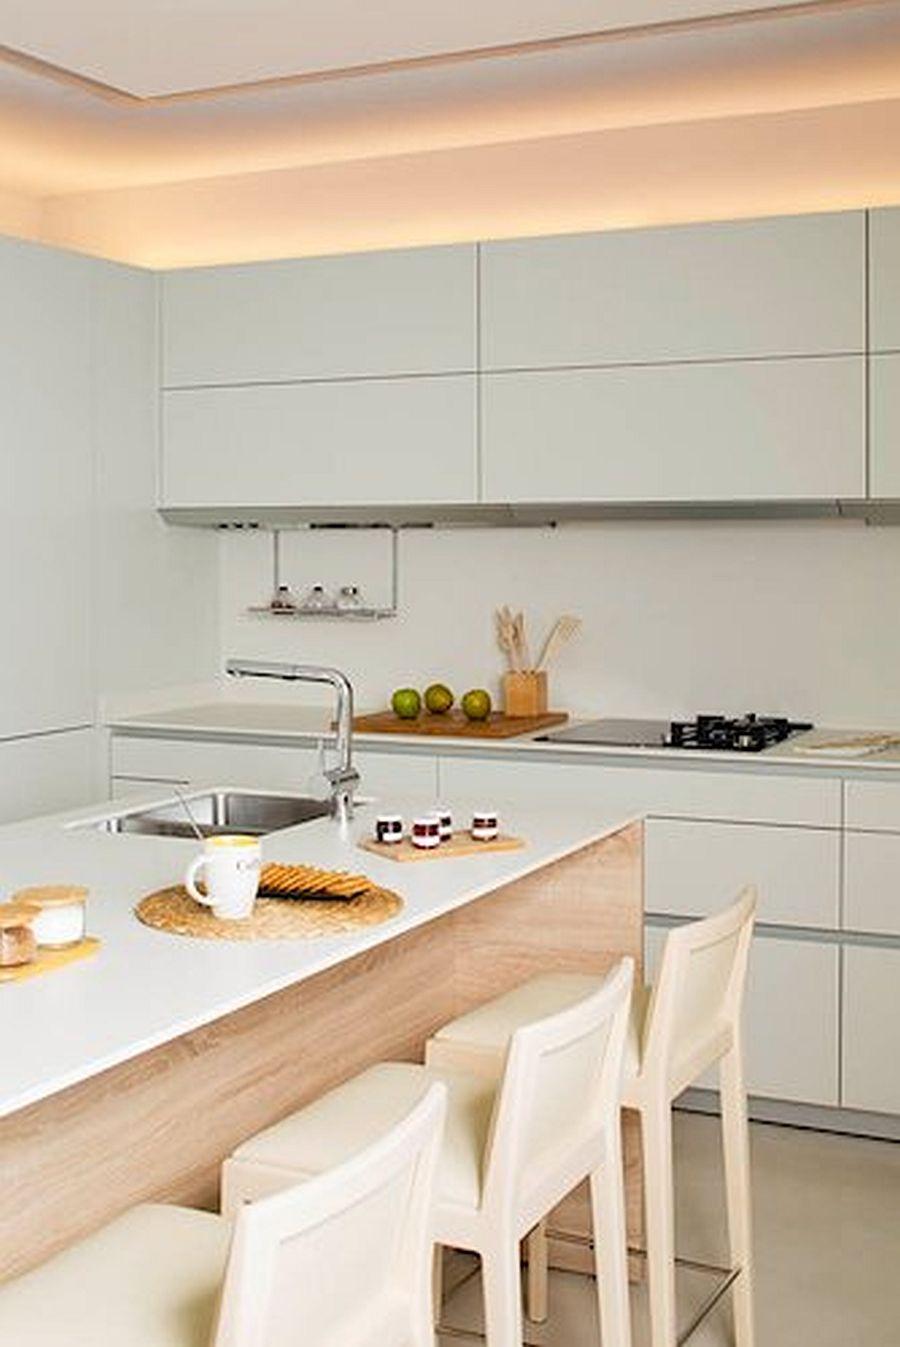 adelaparvu.com despre renovare apartament in cladire veche, casa Barcelona, designer Meritxell Ribe (22)